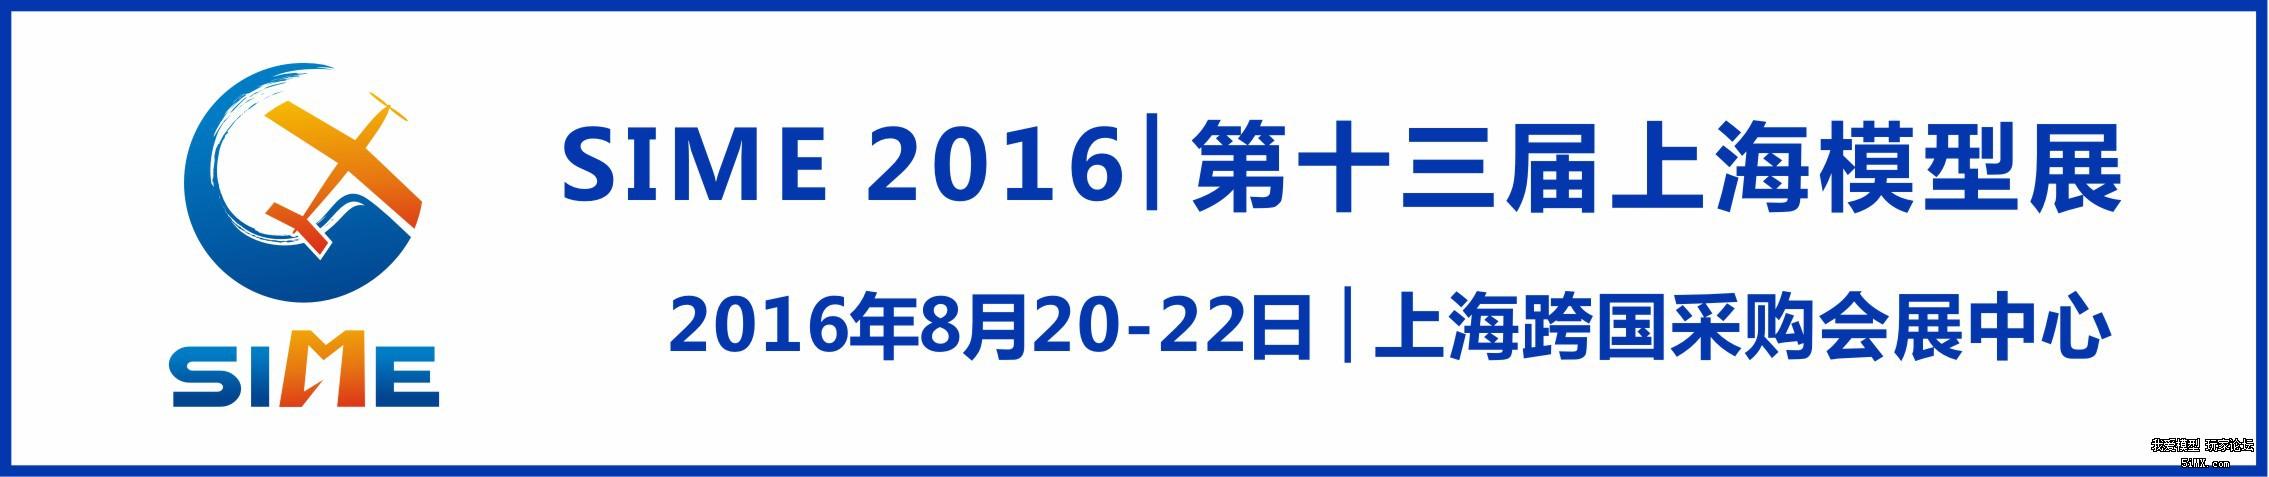 SIME 2016 | 3��1503 λ����Ԥ�Ǽdzɹ�����ȥ��ͬ��258%��